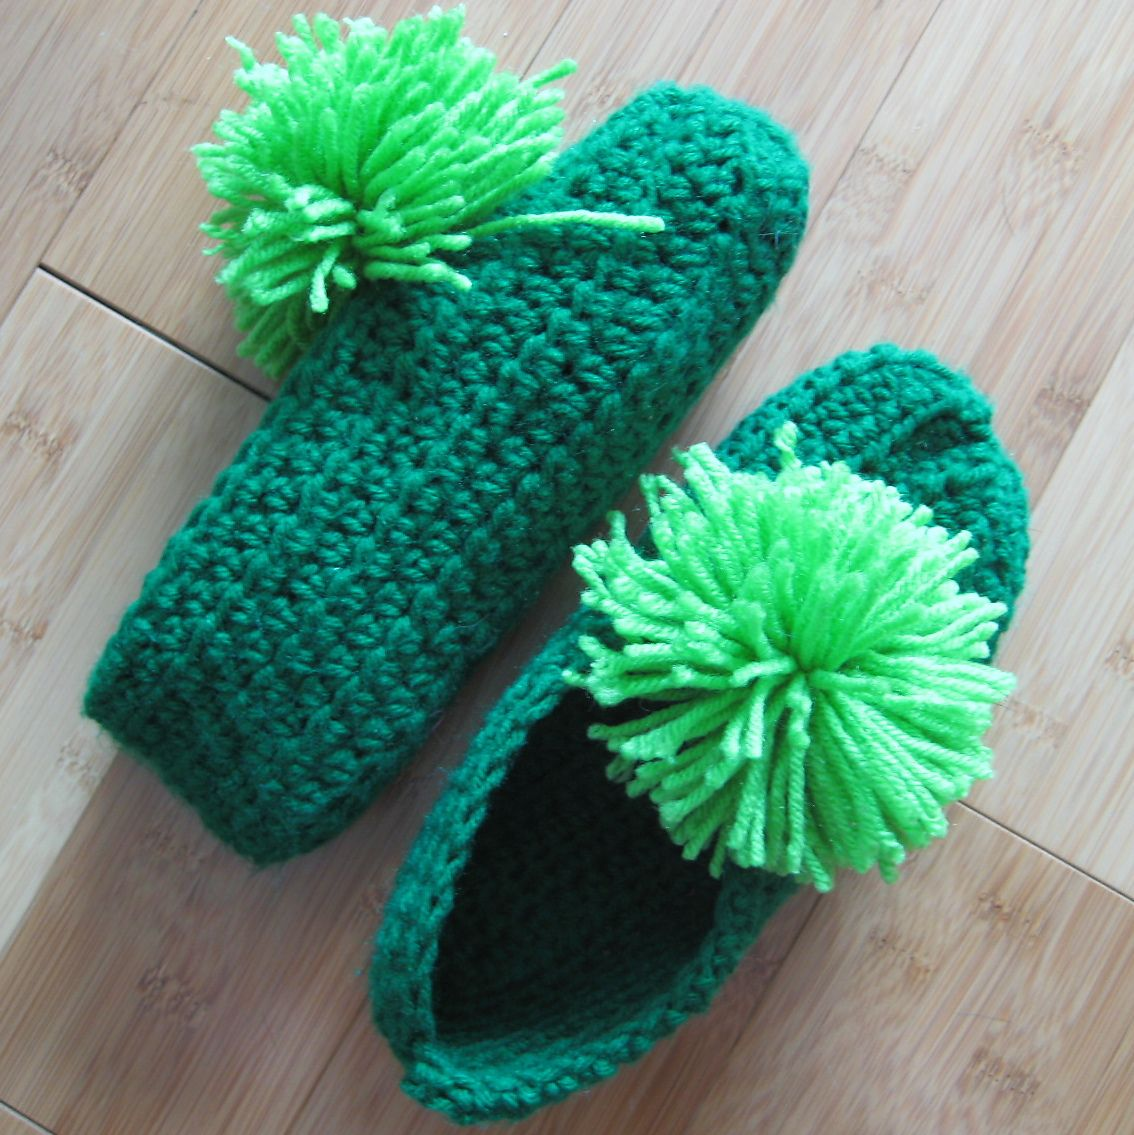 f8dd5200a Nana Slippers By Sarah Wales - Free Crochet Pattern - (ravelry ...